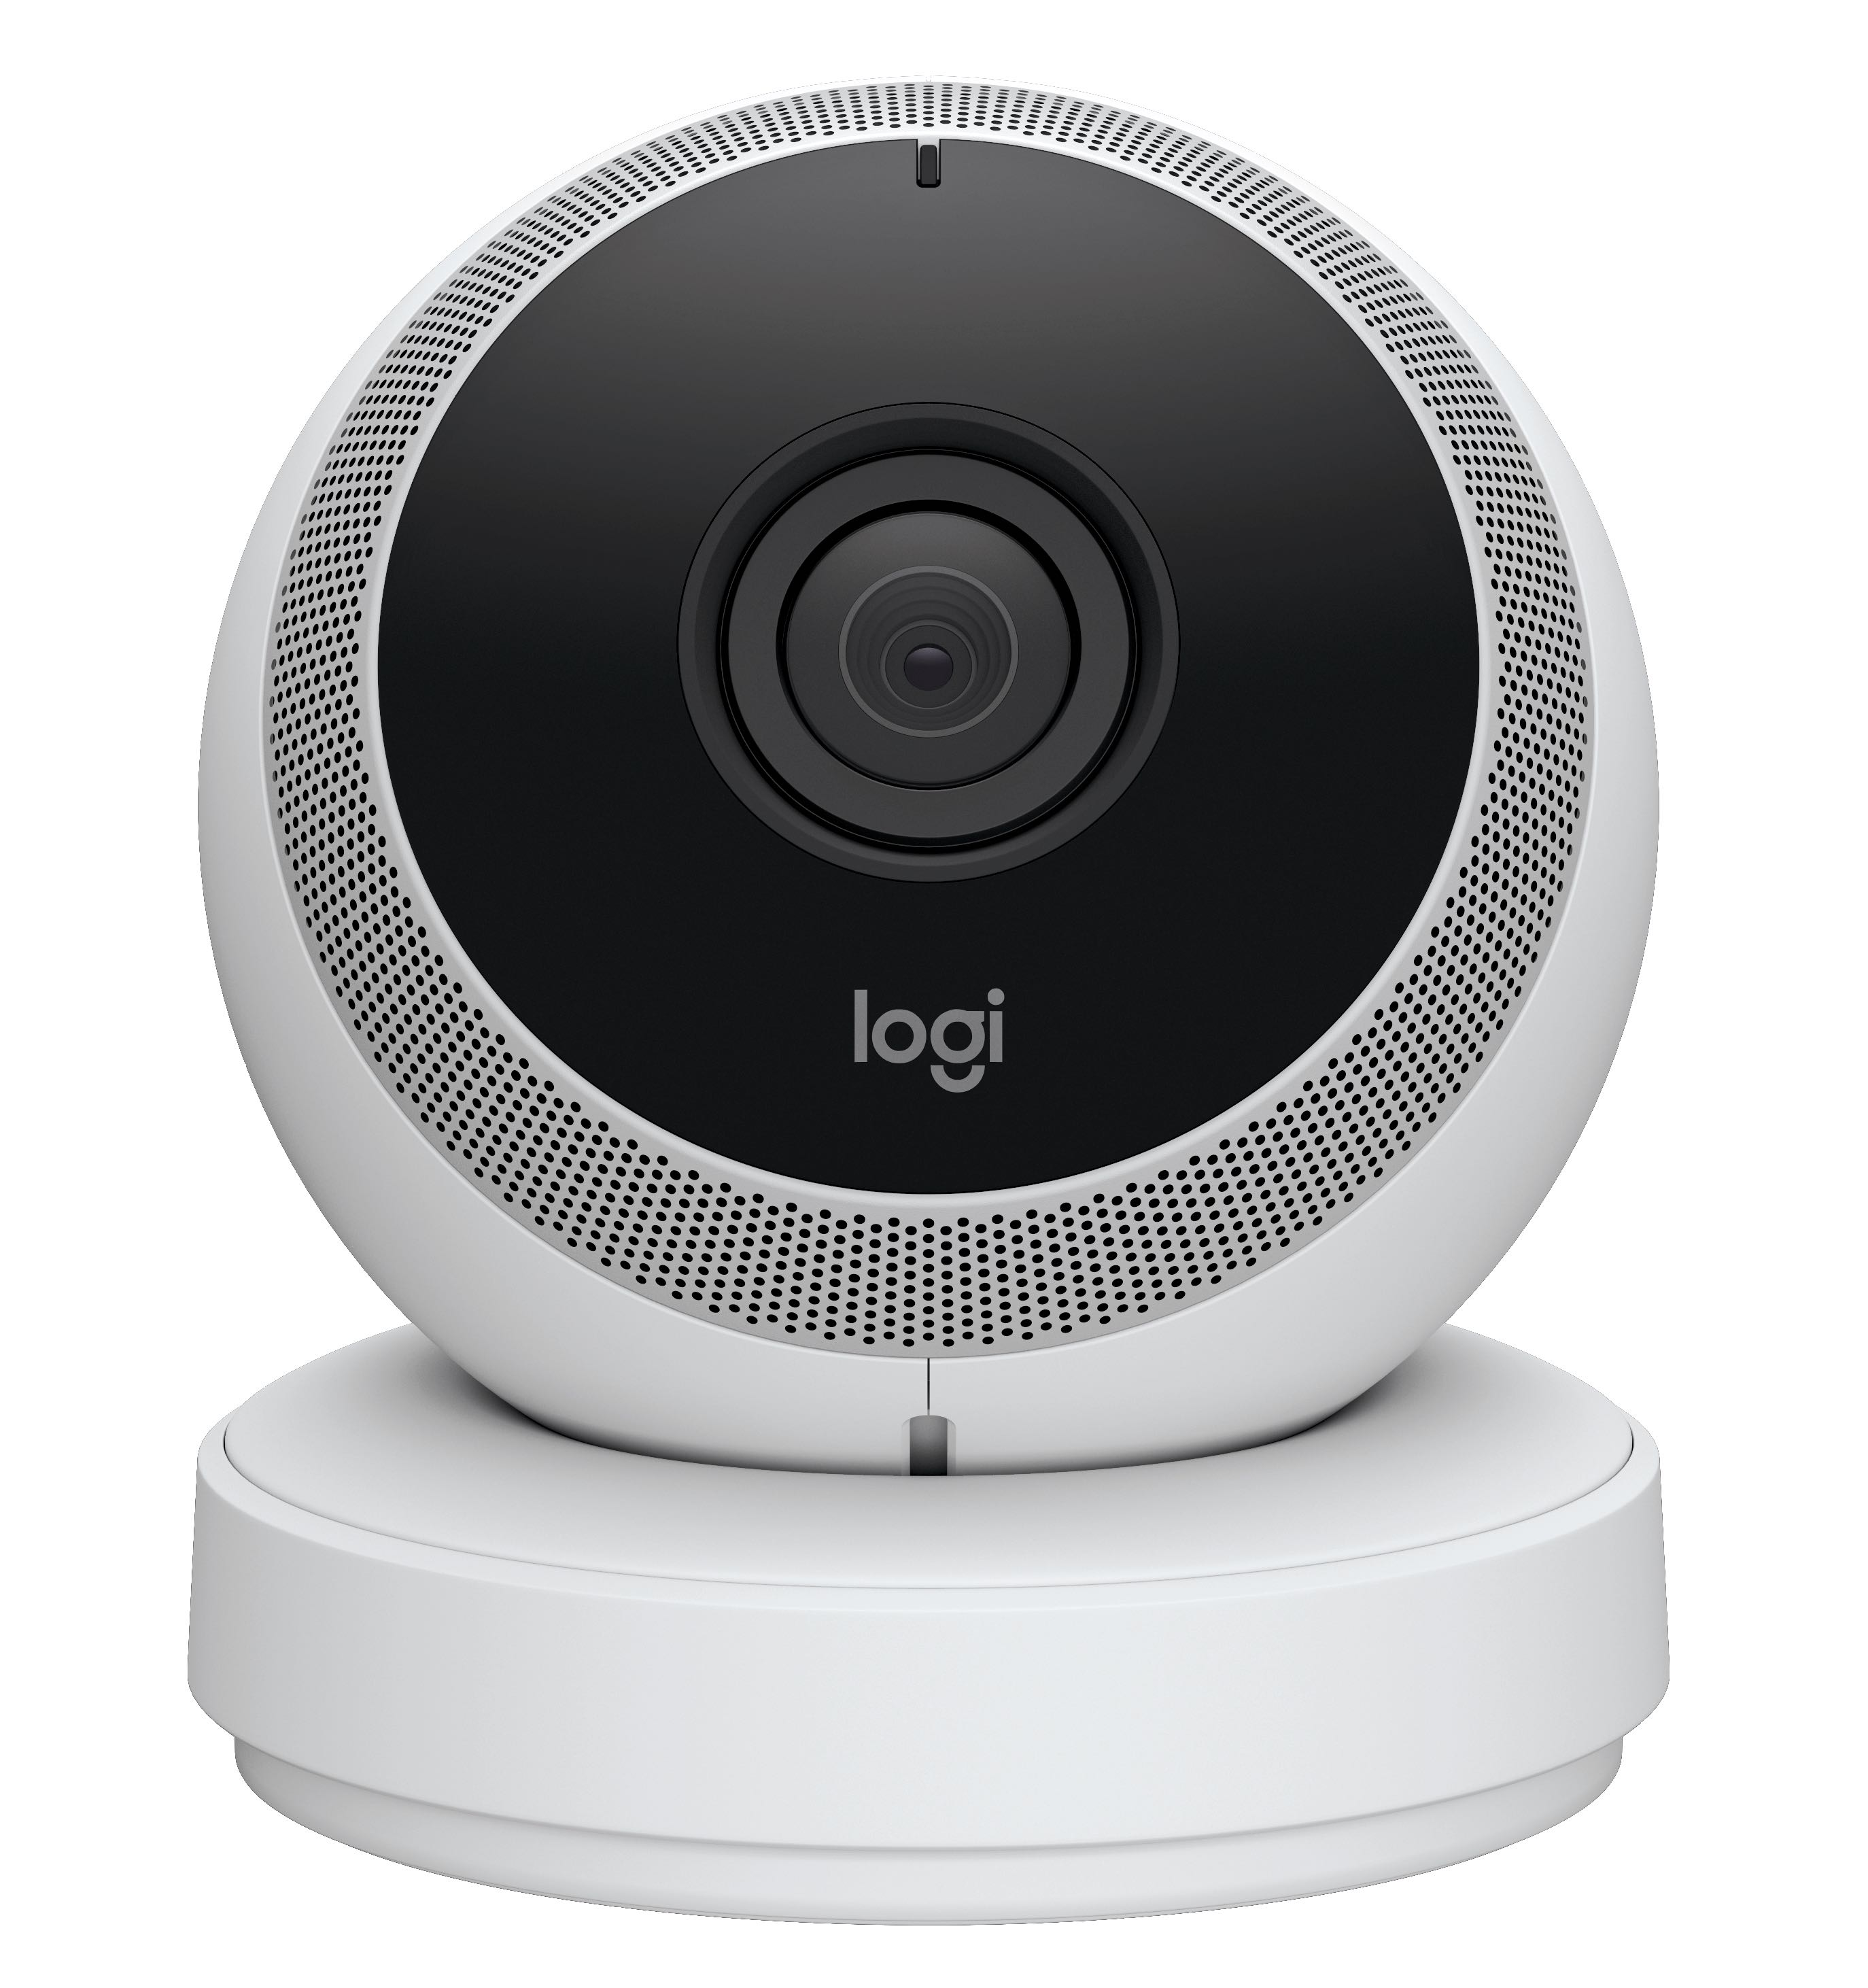 Logitech Logi Circle image 001